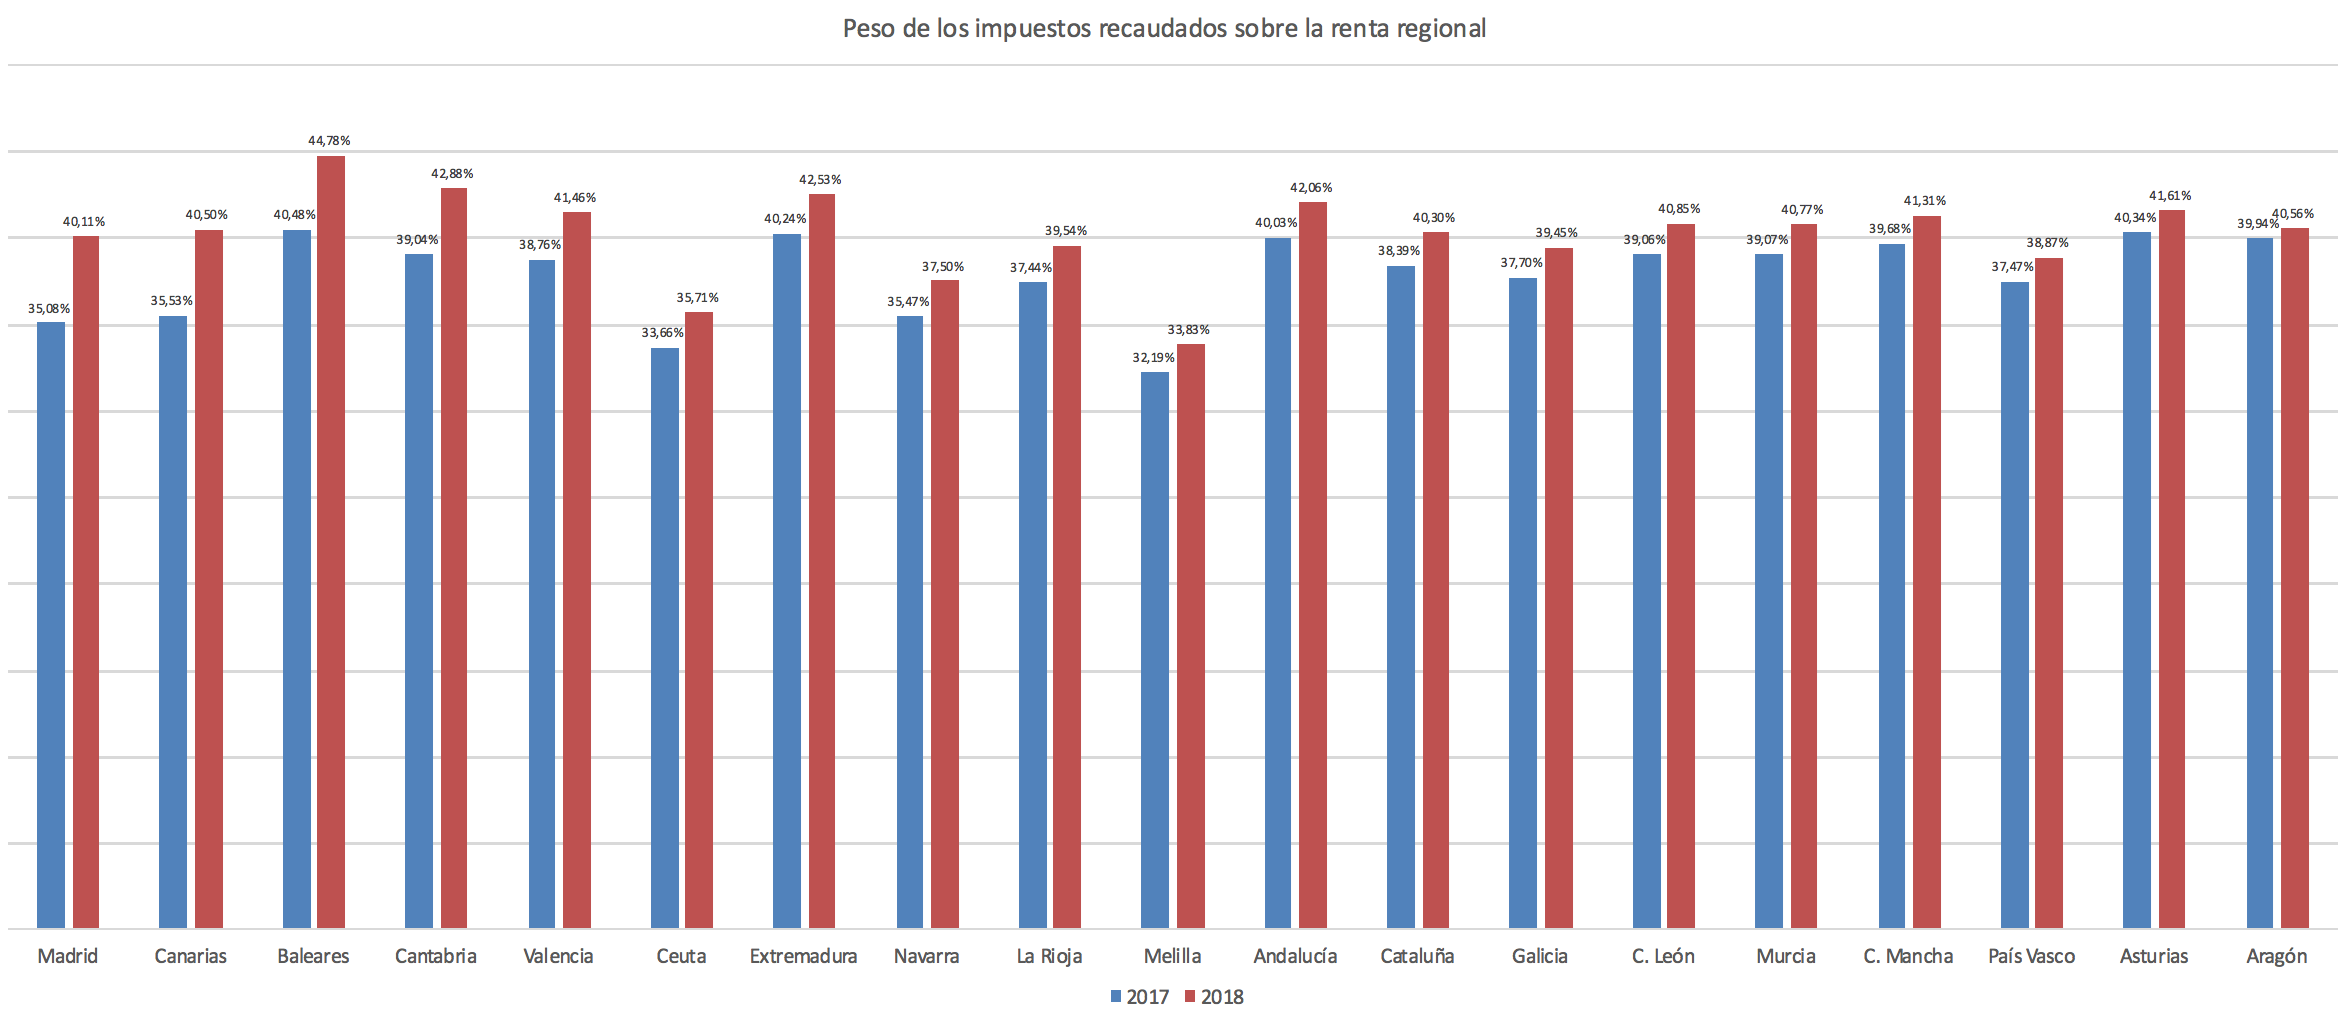 1-presion-fiscal-sobre-renta-regional.pn